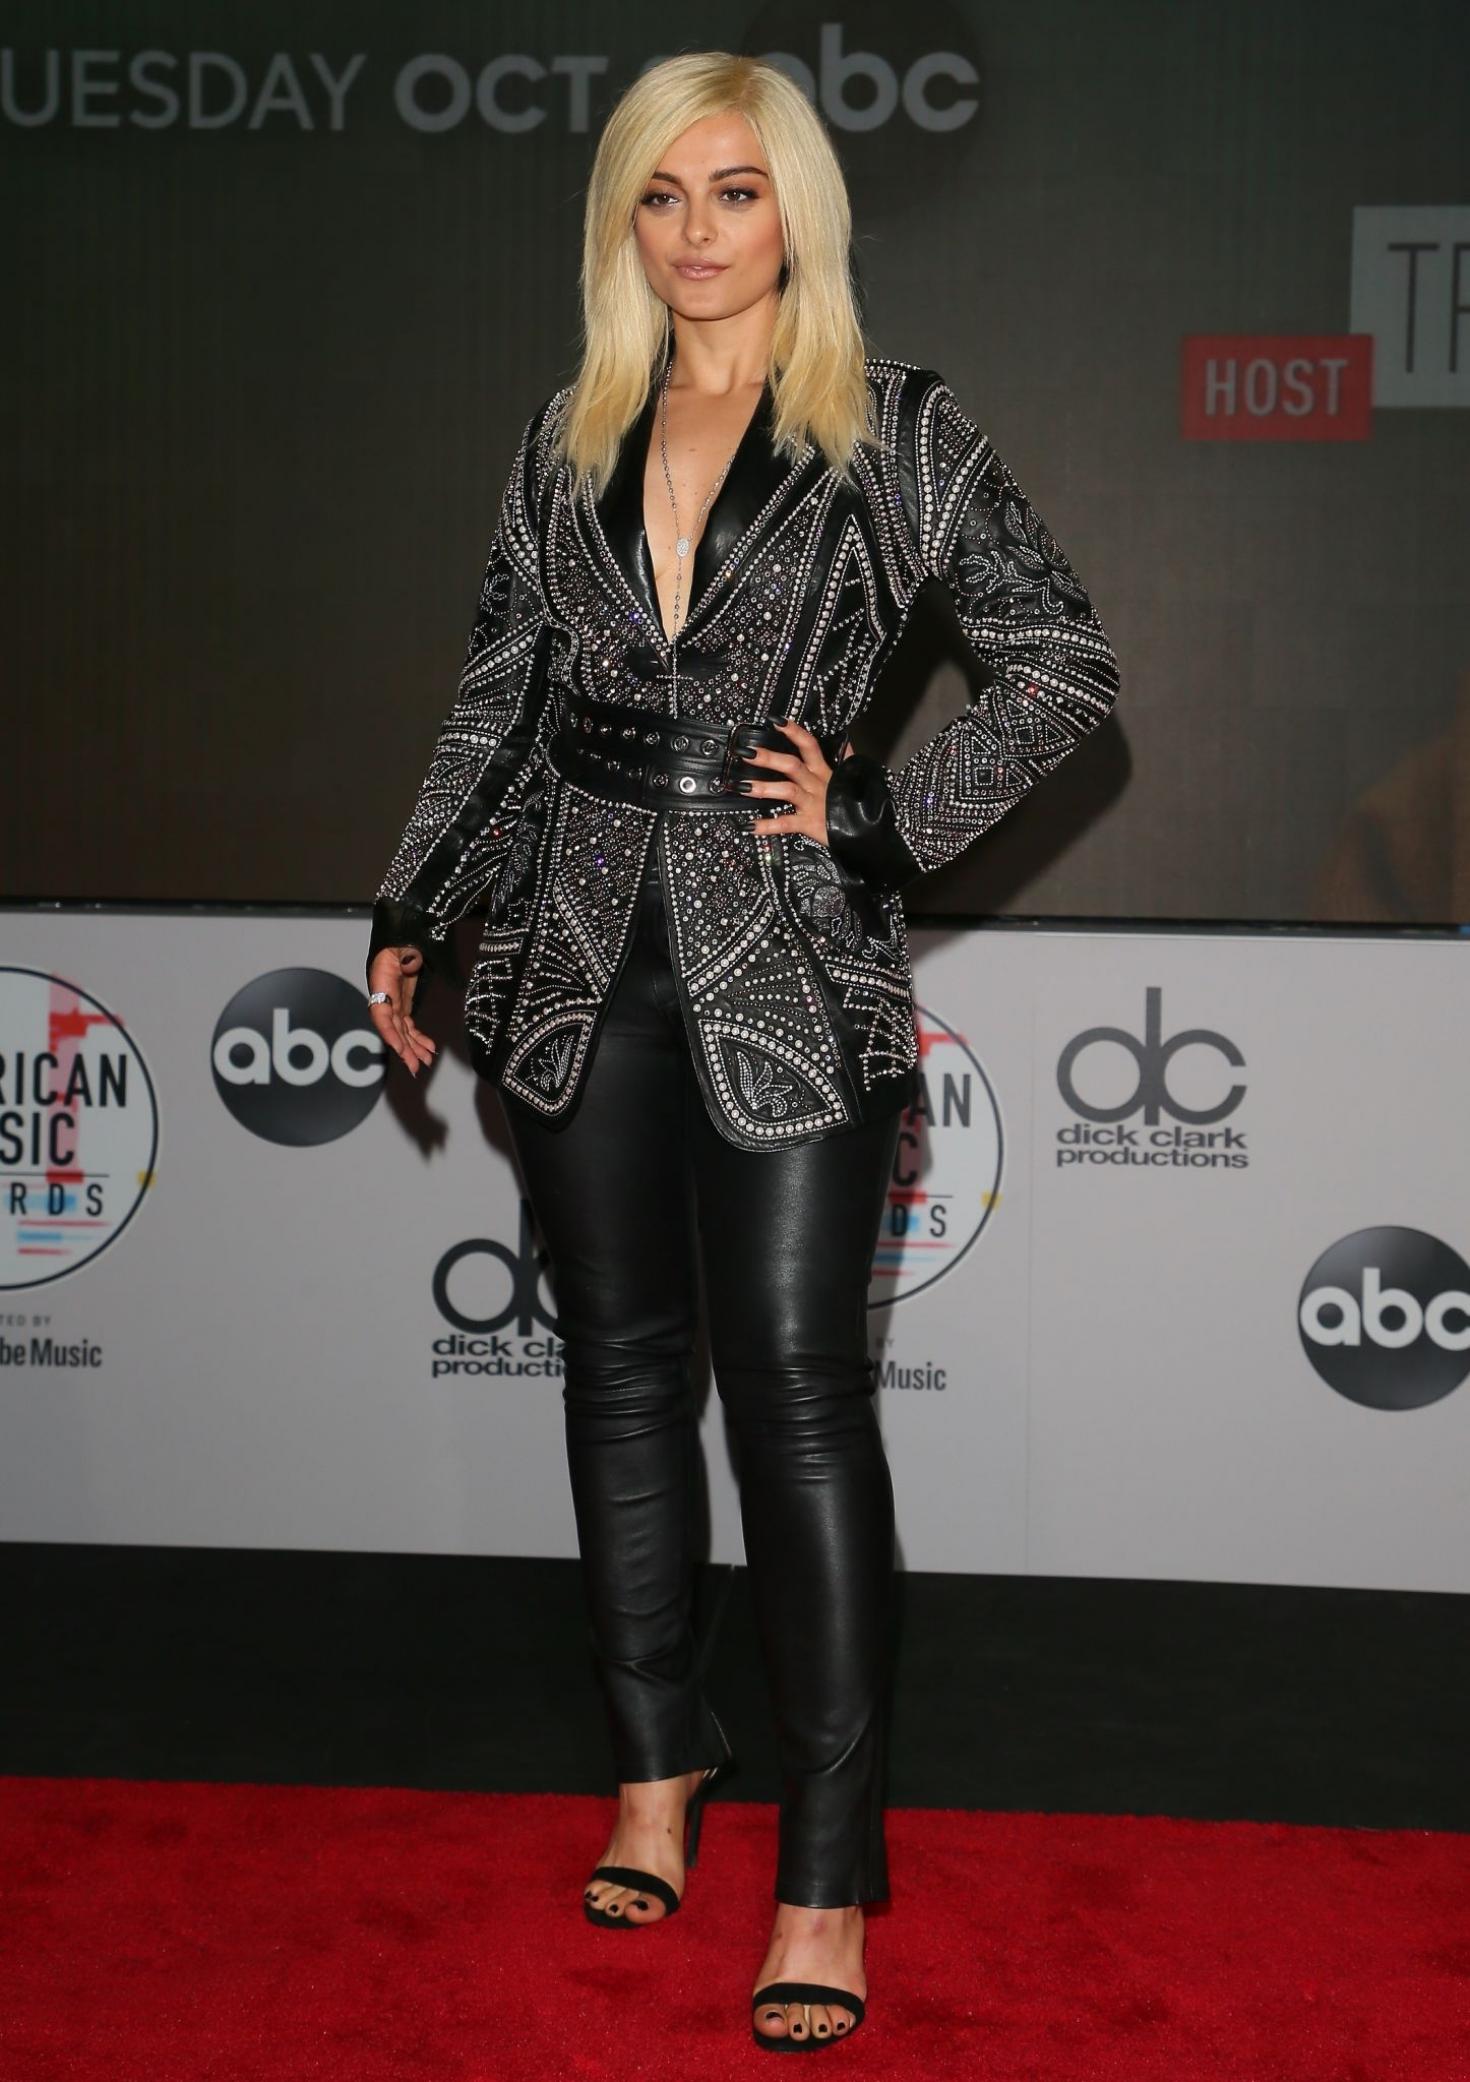 Bebe Rexha 2018 : Bebe Rexha: 2018 American Music Awards Nominations Announcement -13